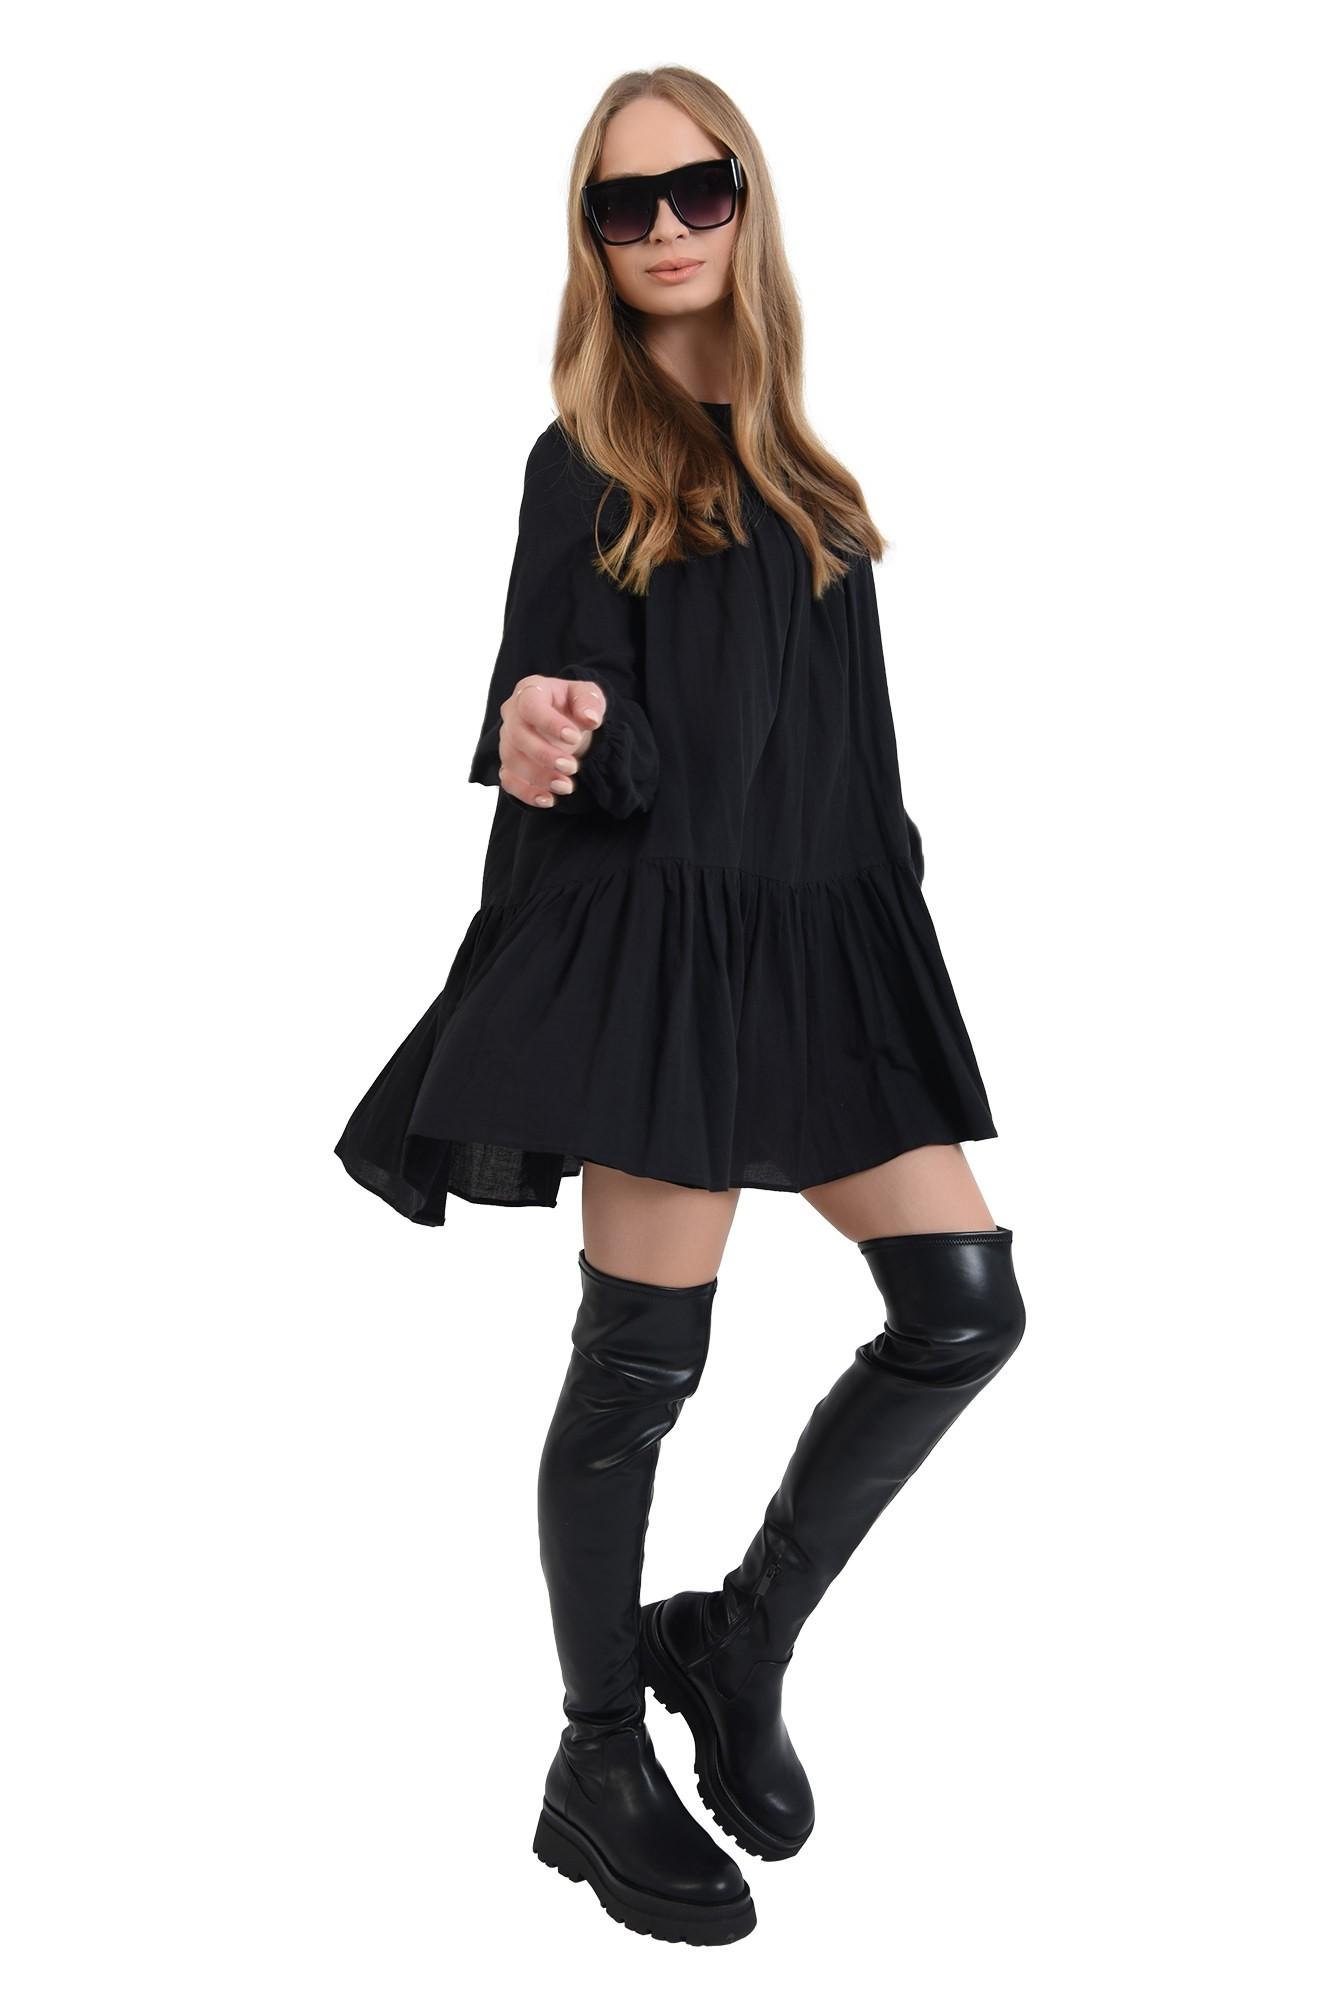 3 - 360 - rochie neagra scurta,cu maneca lunga Poema